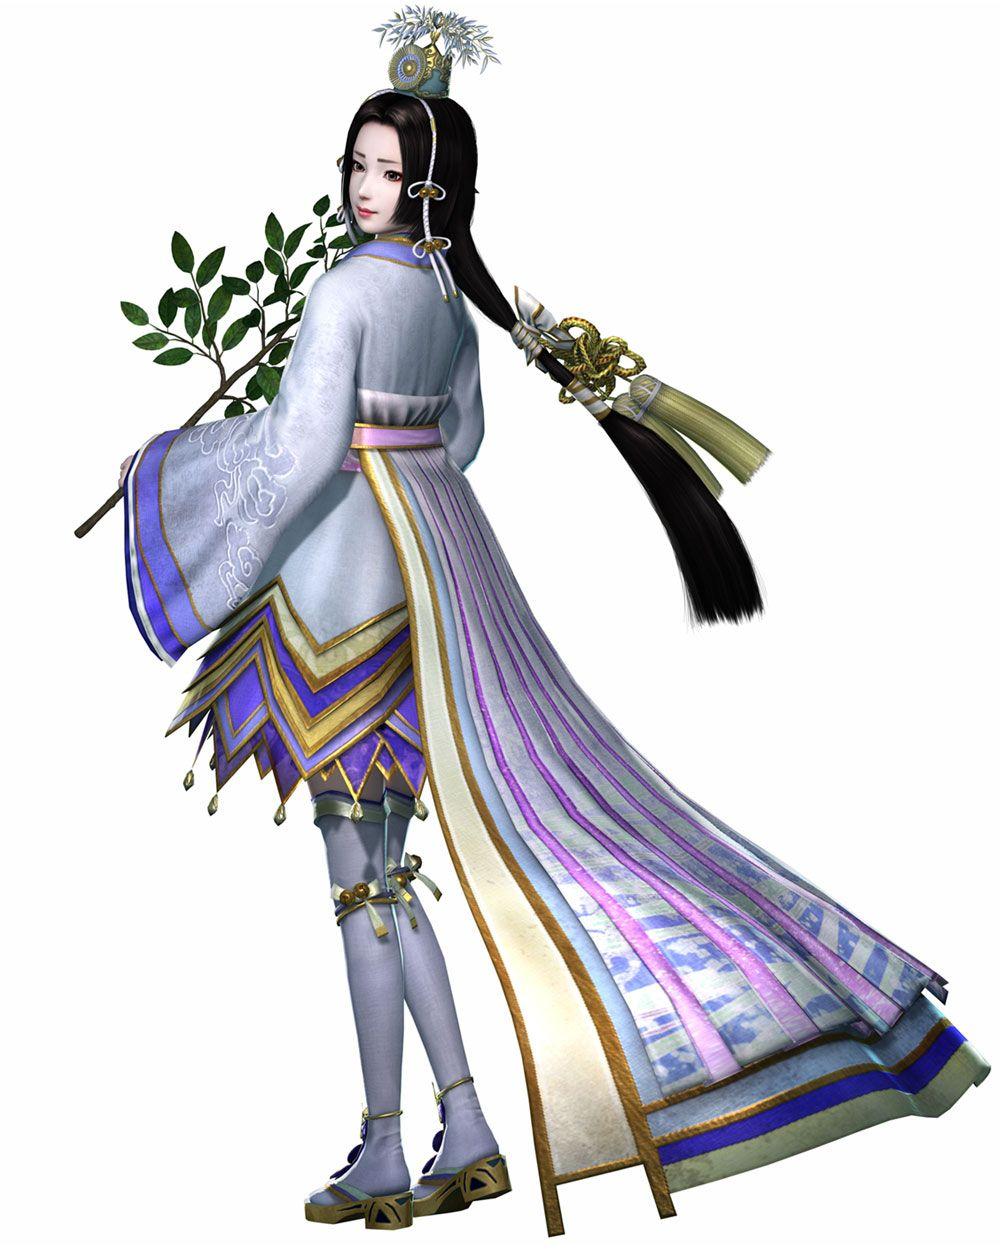 Warriors Orochi 3 Art